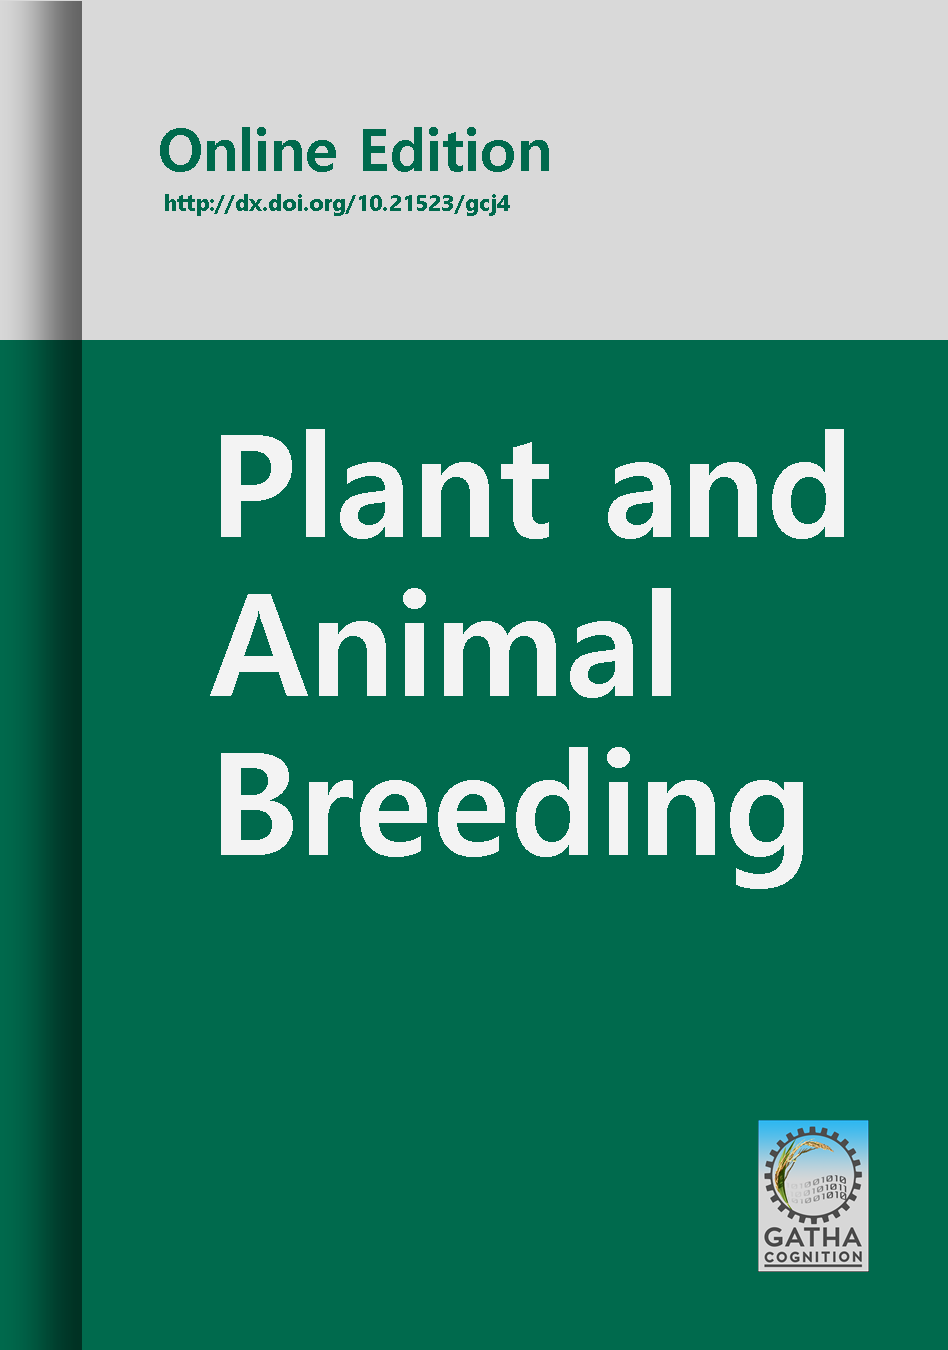 Plant and Animal Breeding